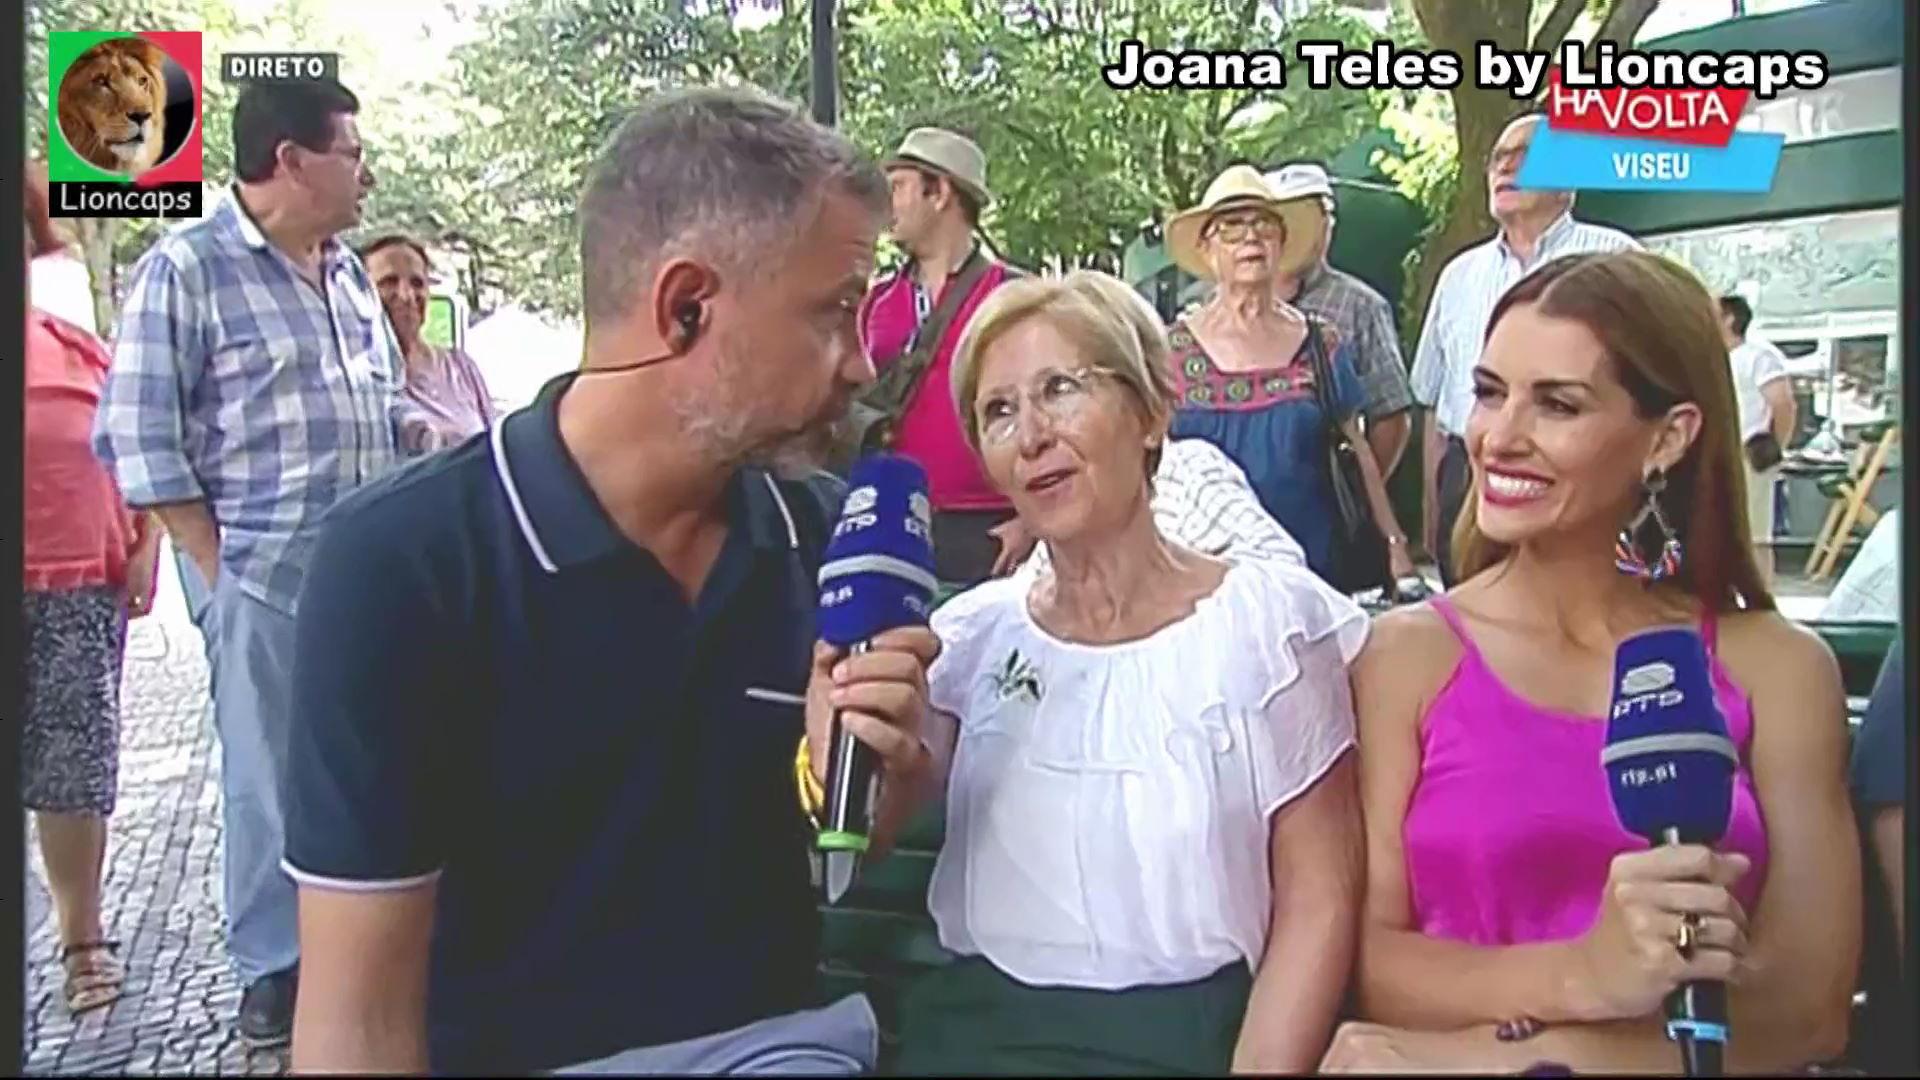 463438215_joana_teles_vs190602_0107_122_40lo.JPG